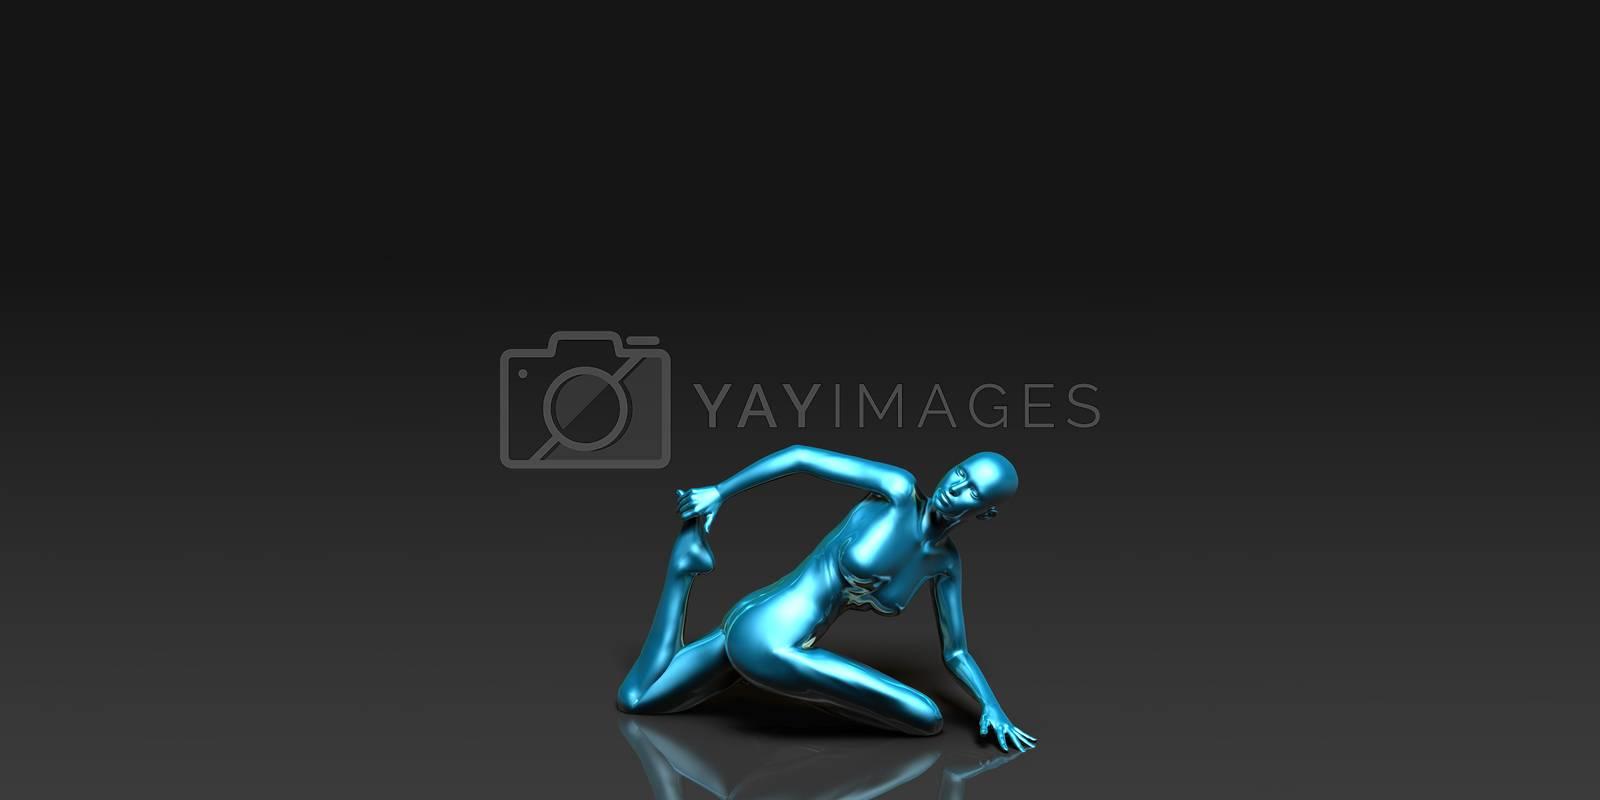 Yoga Class, the Spine Twist Basic Pose Stance